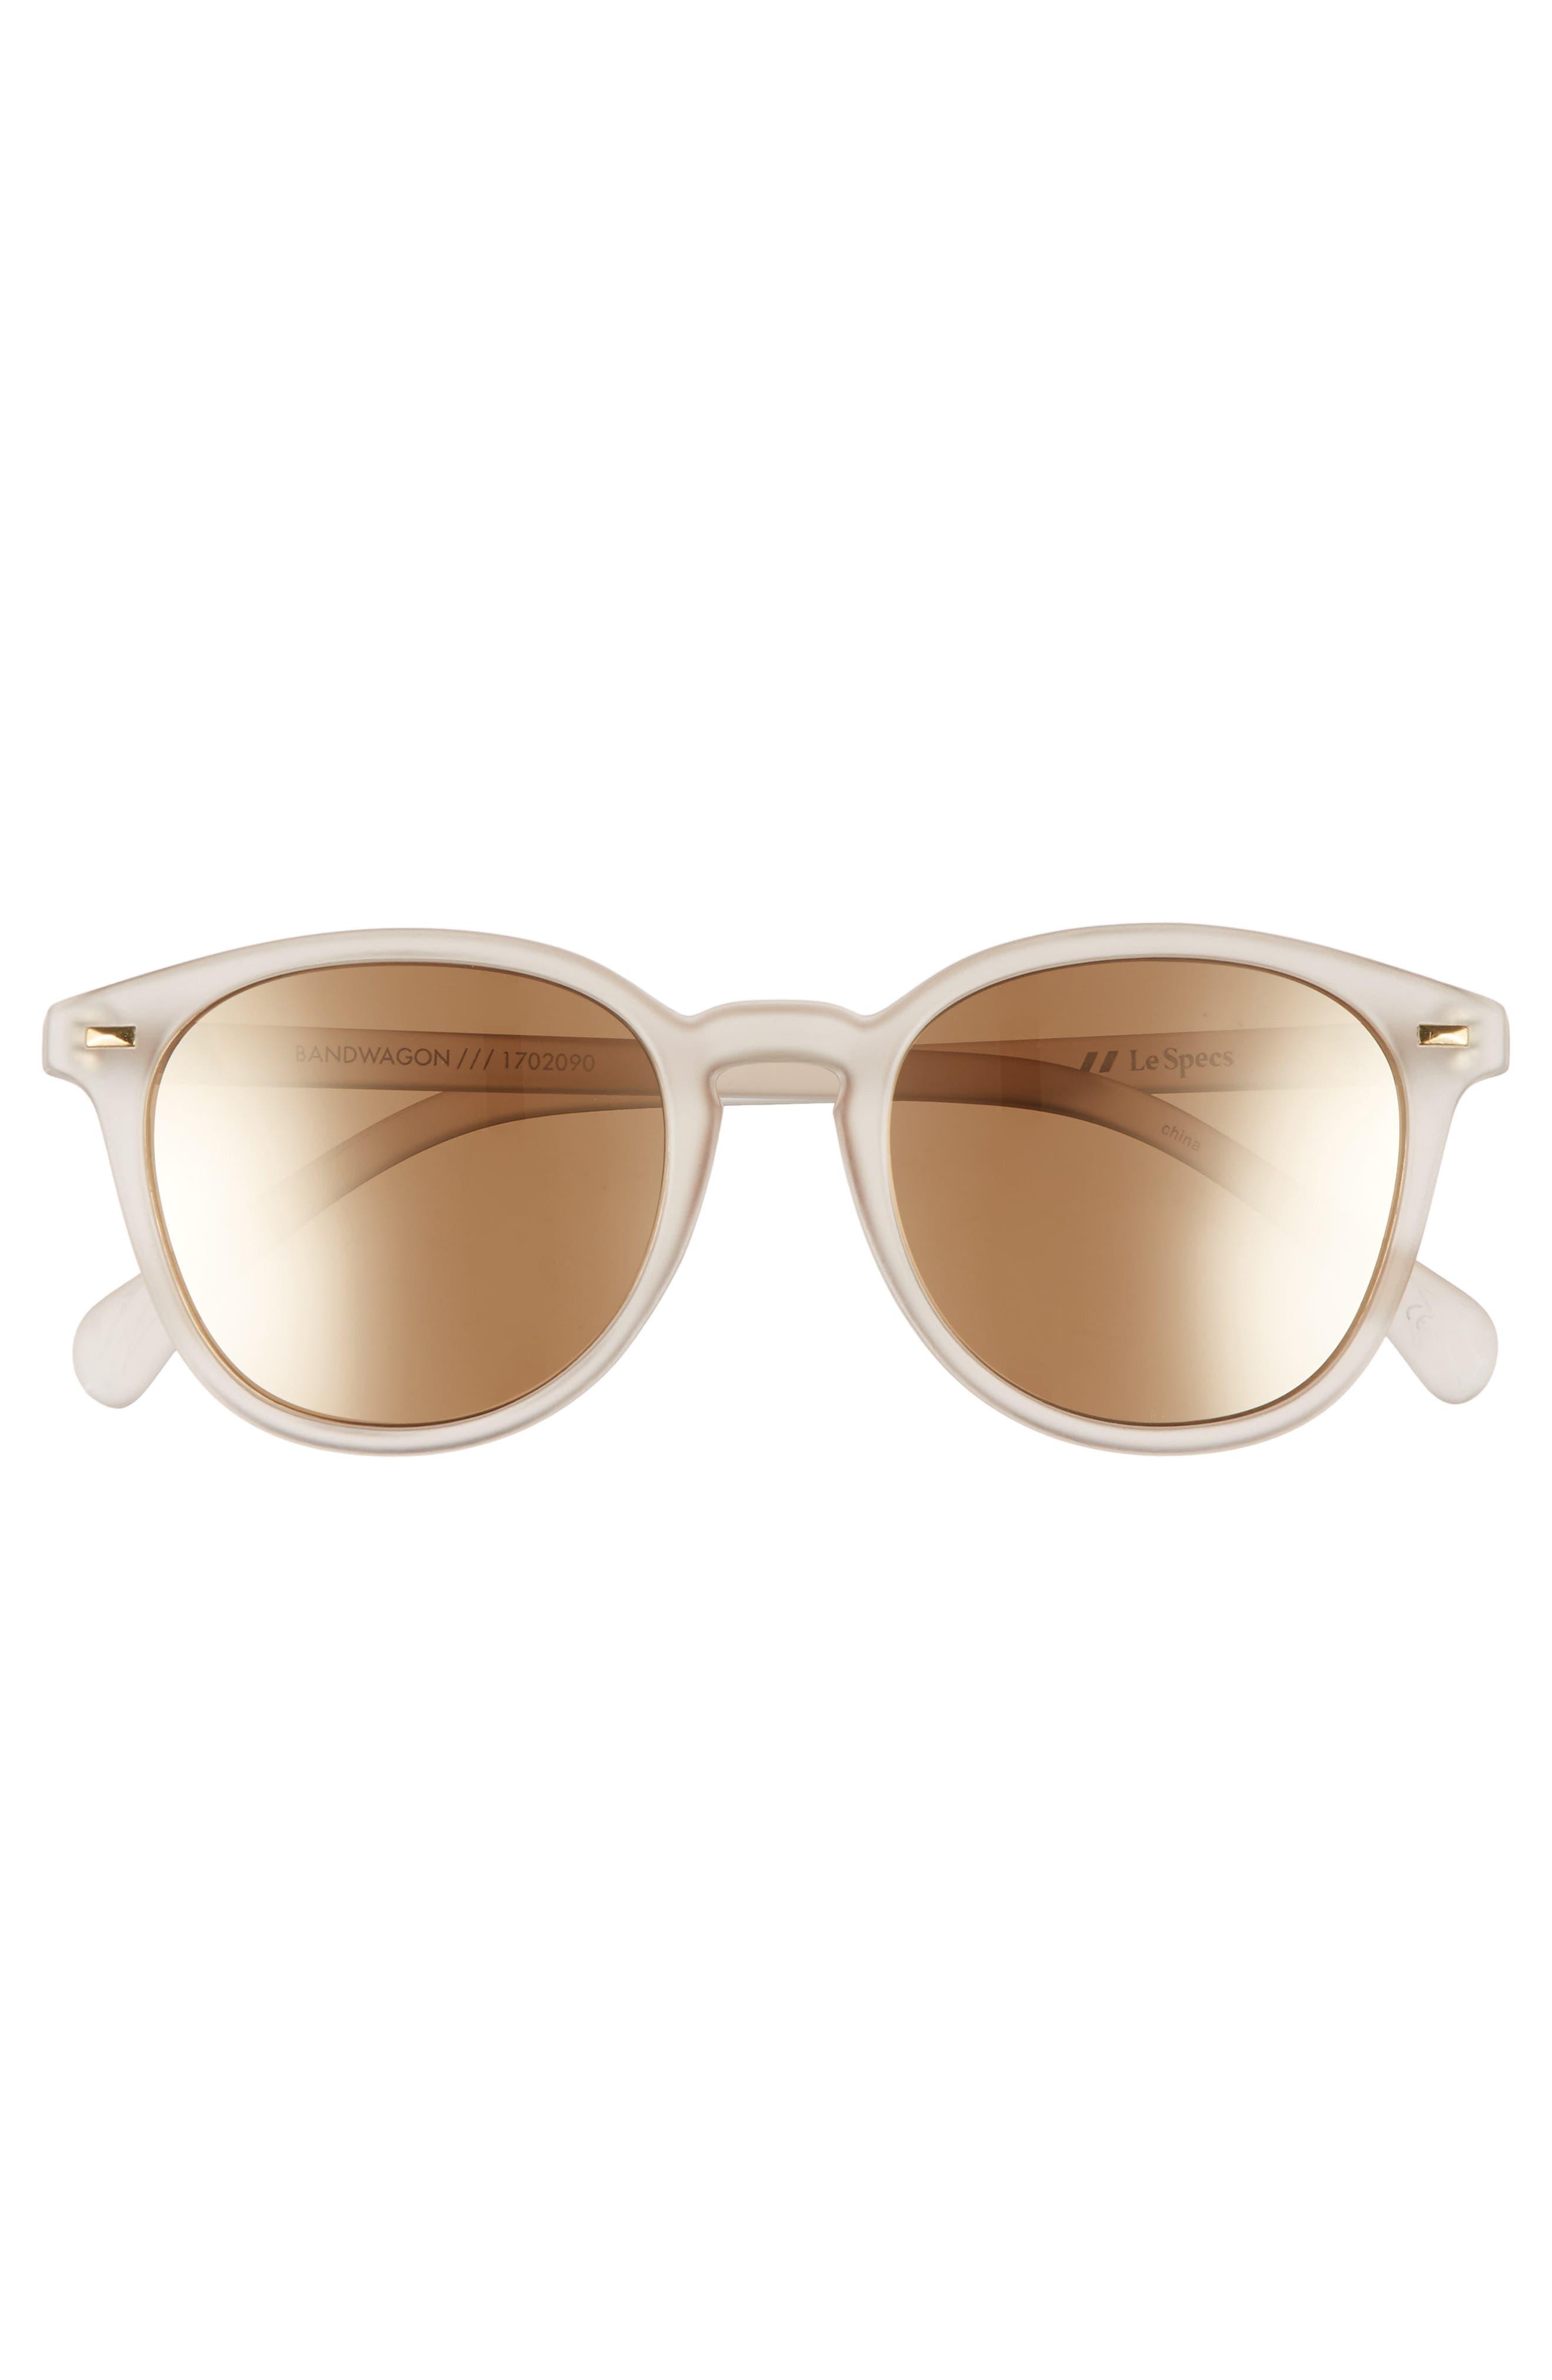 'Bandwagon' 51mm Sunglasses,                             Alternate thumbnail 3, color,                             Matte Stone